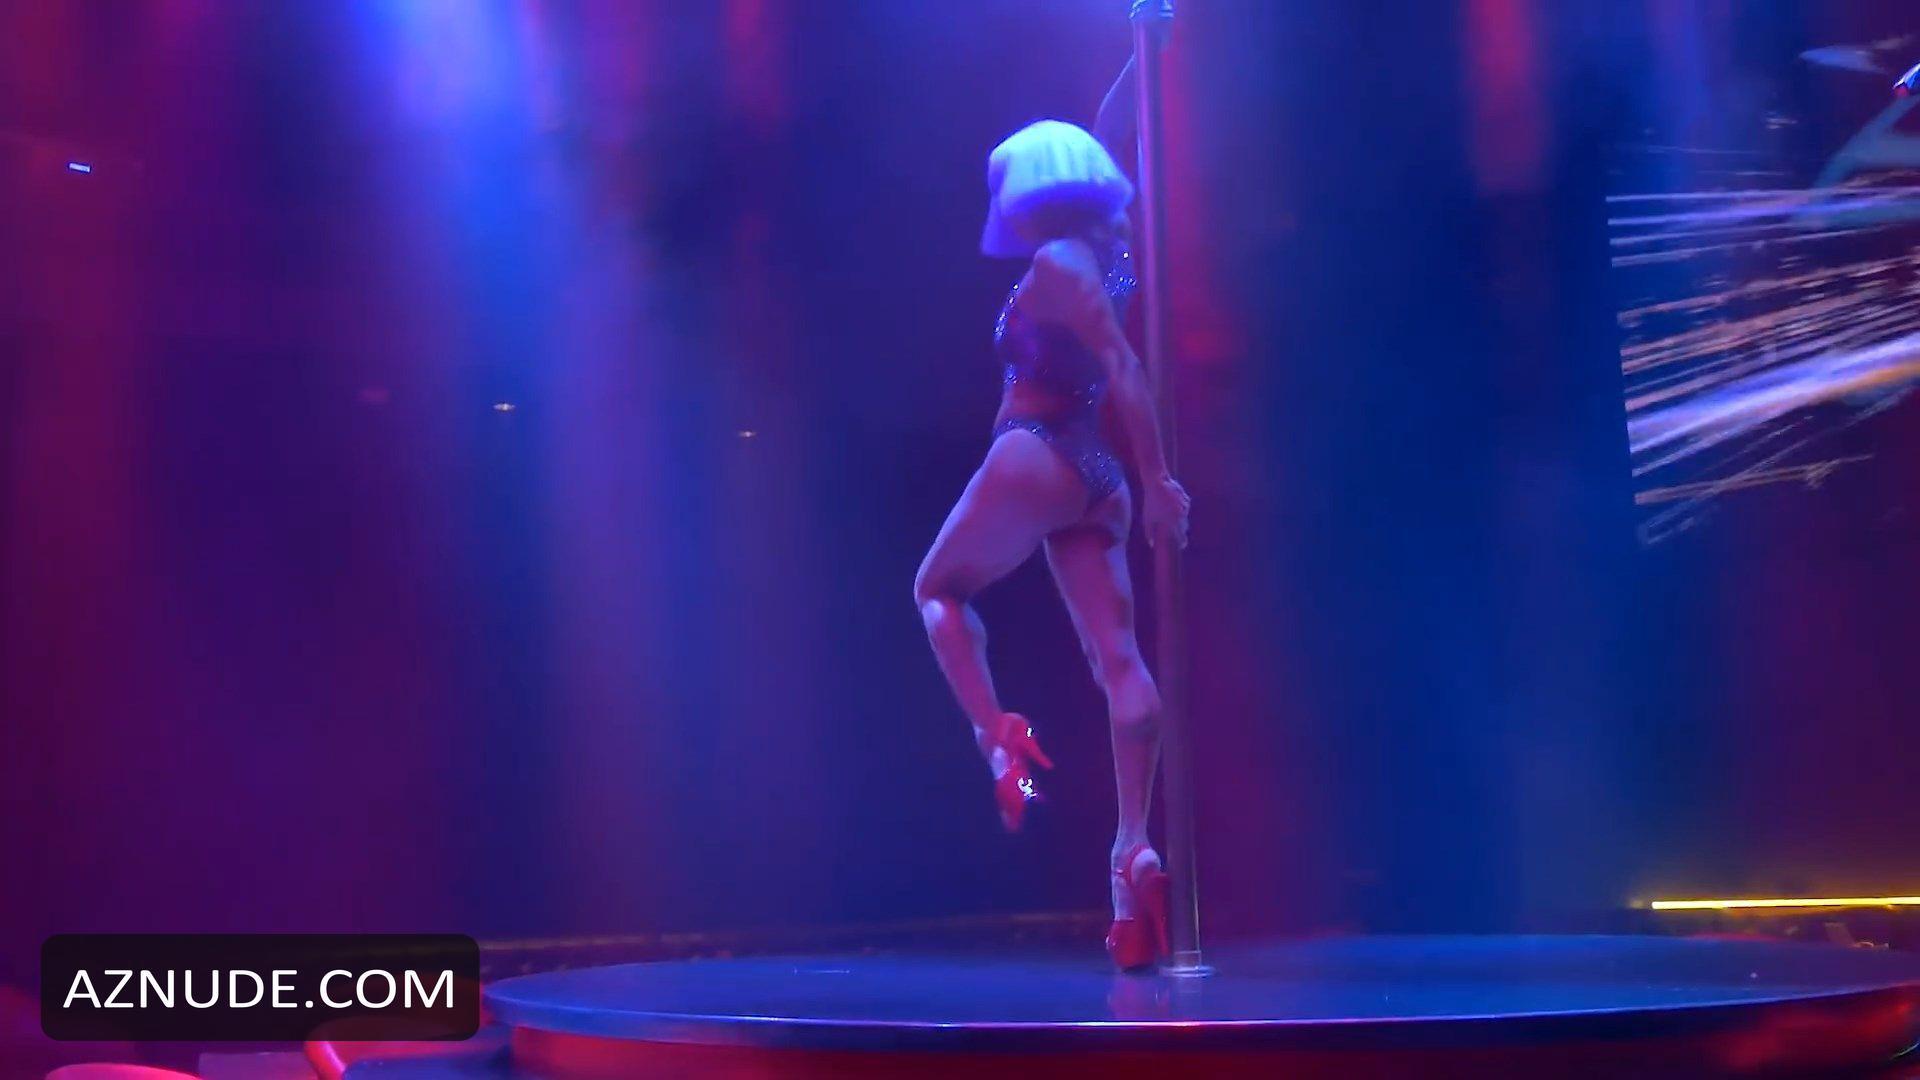 Celeb Misty Copeland Nude Pictures